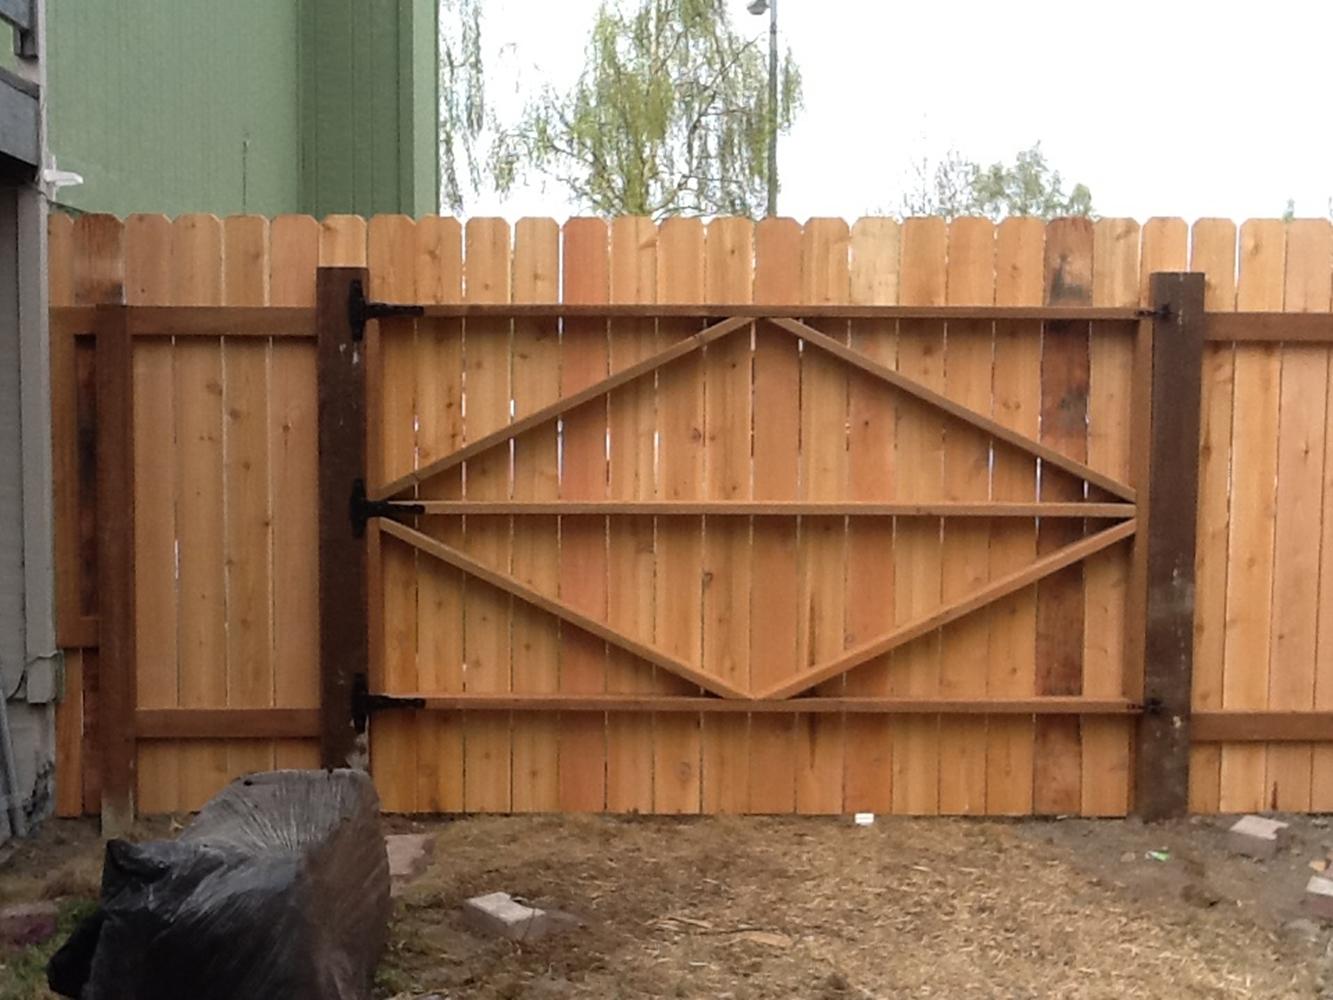 Alaska Fence and Deck Install 4